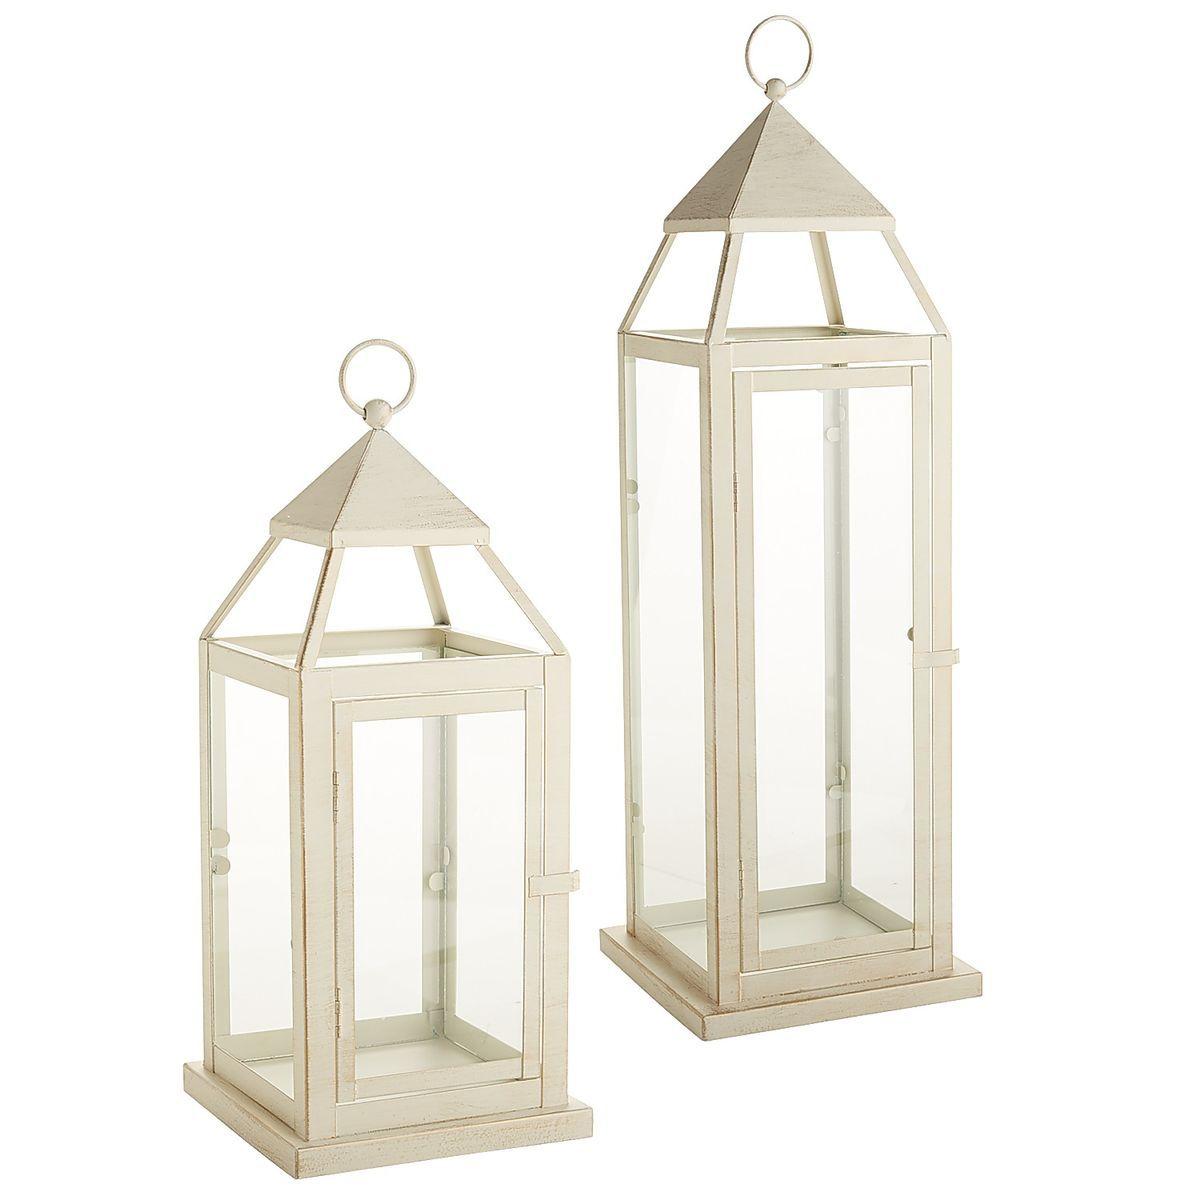 landen lanterns pier 1 imports outdoor lighting lanterns